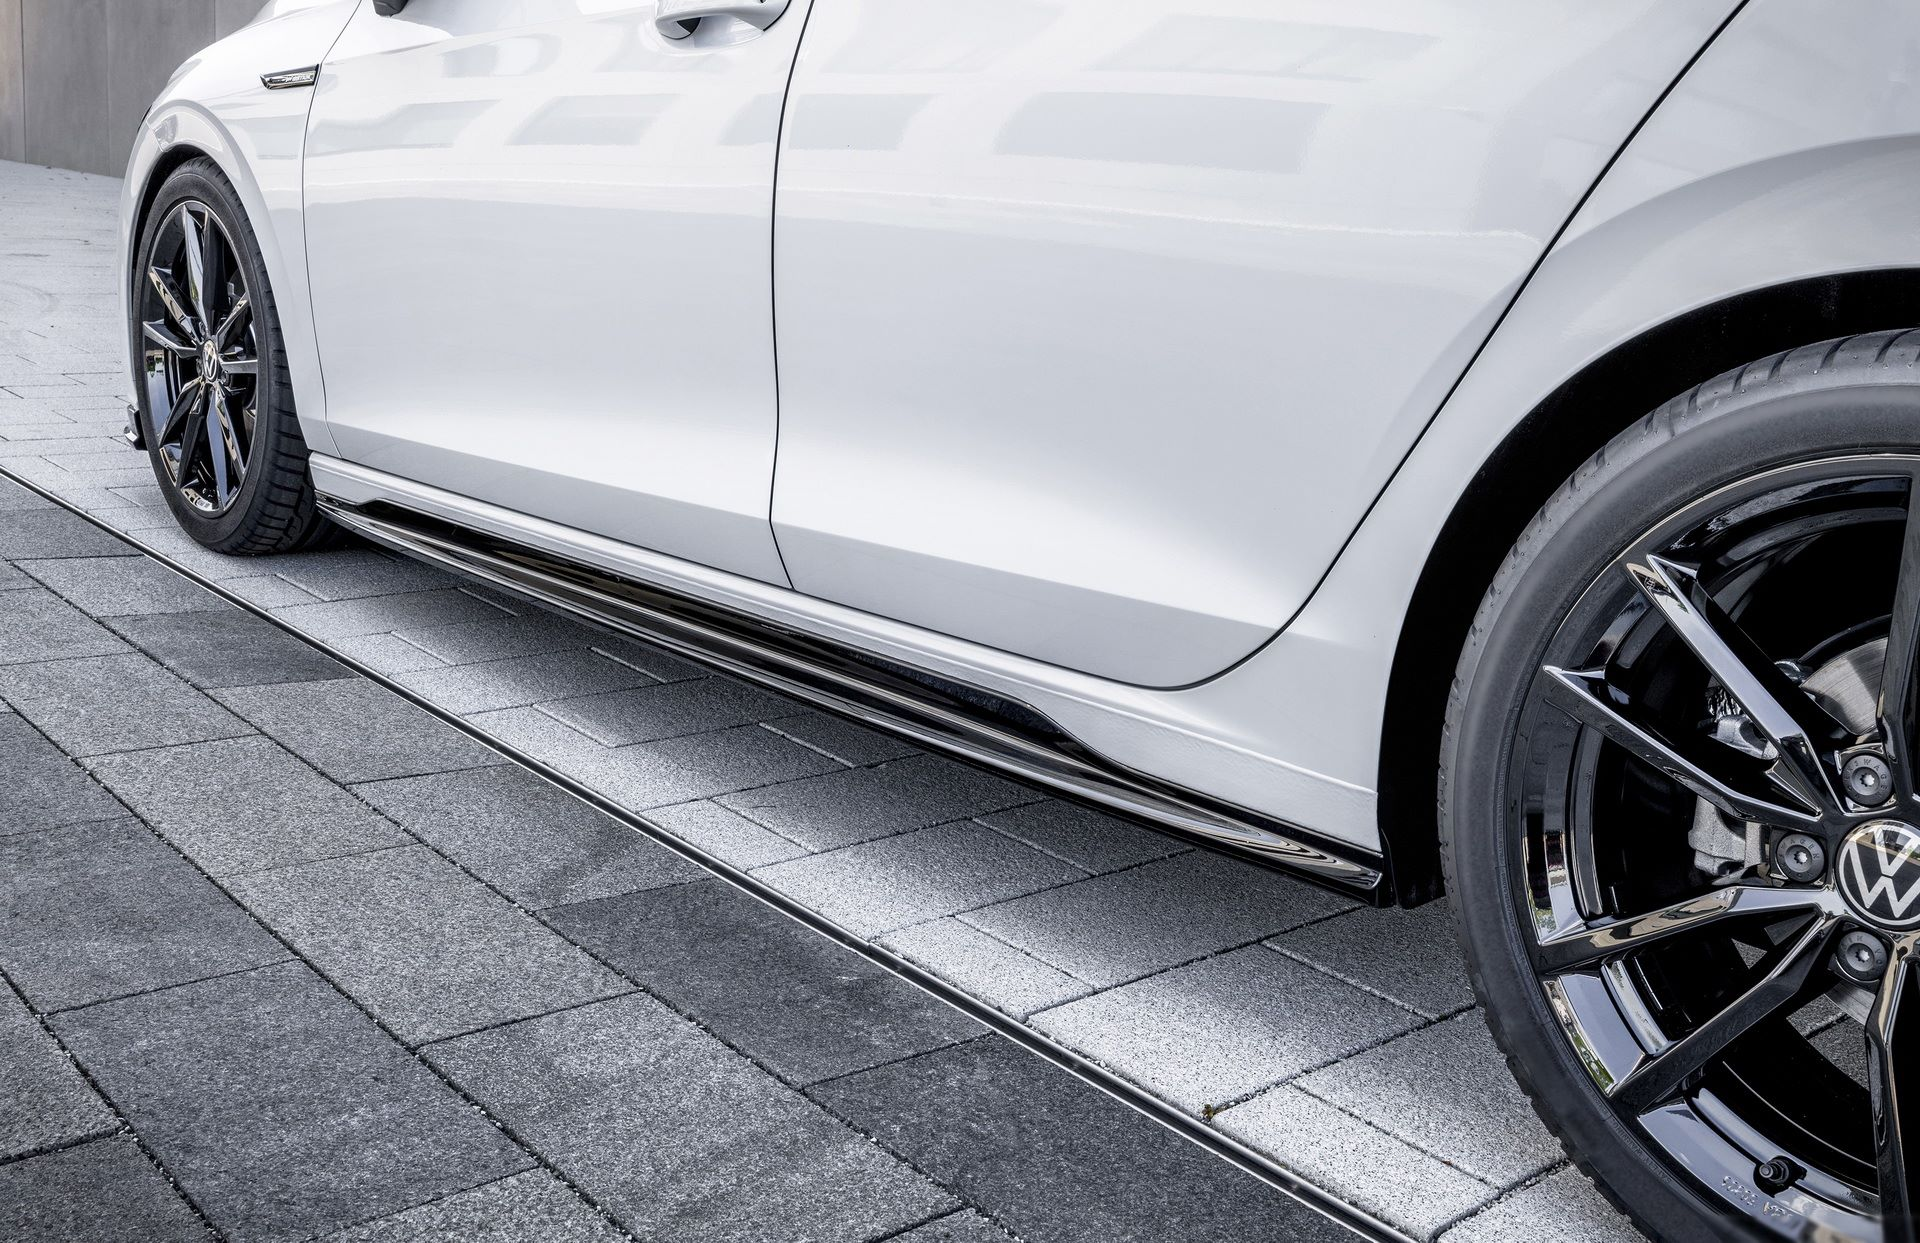 Volkswagen-Golf-8-by-Oettinger-12